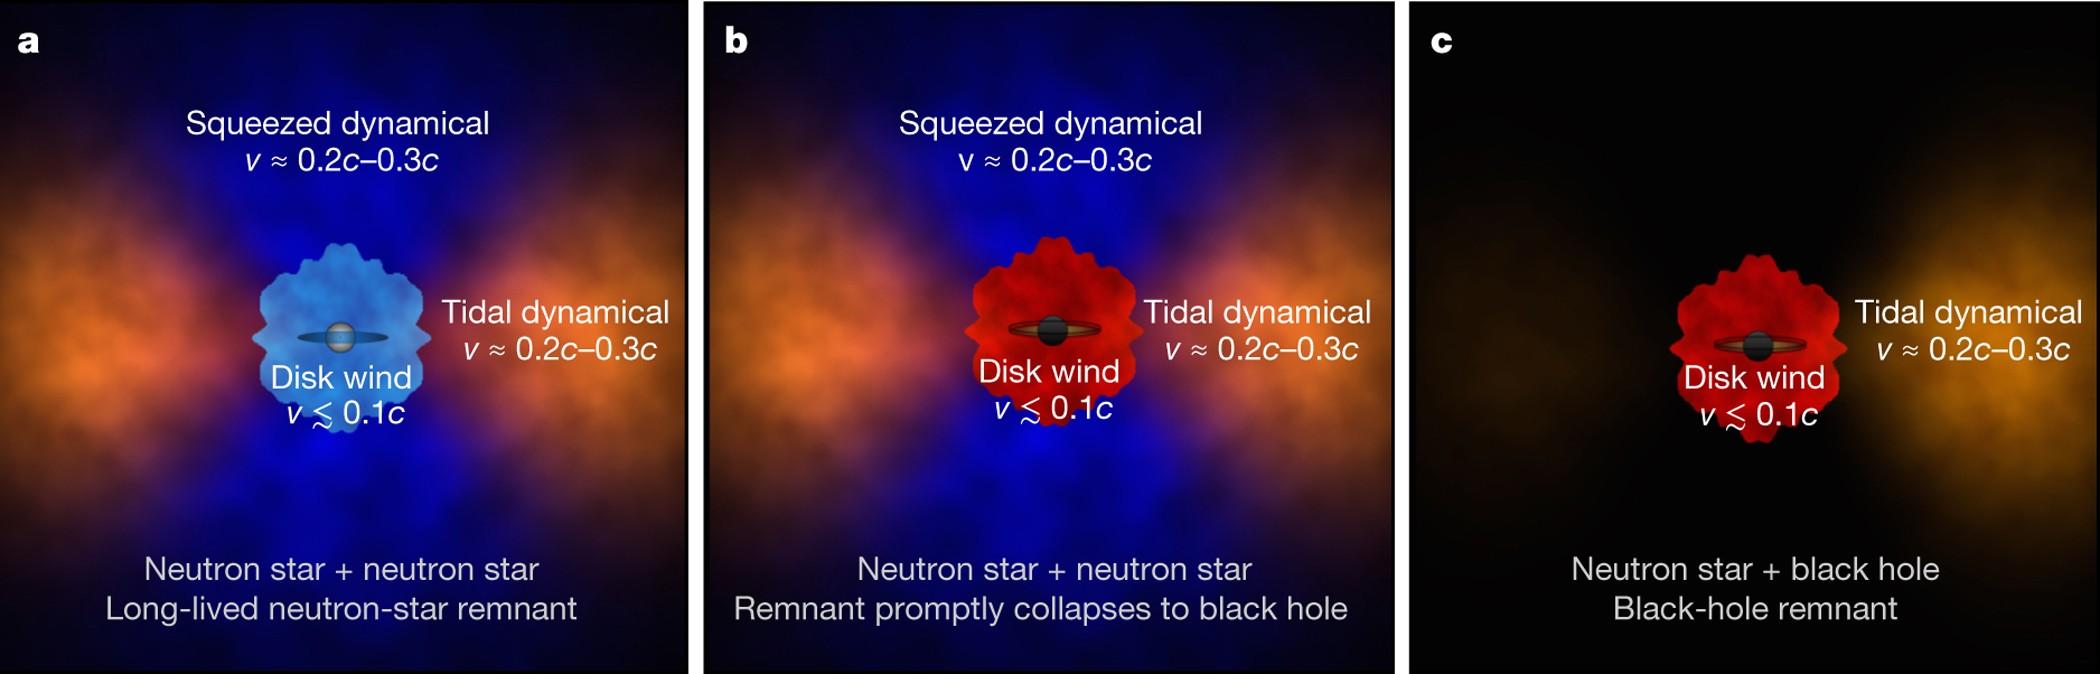 Origin of the heavy elements in binary neutron-star mergers